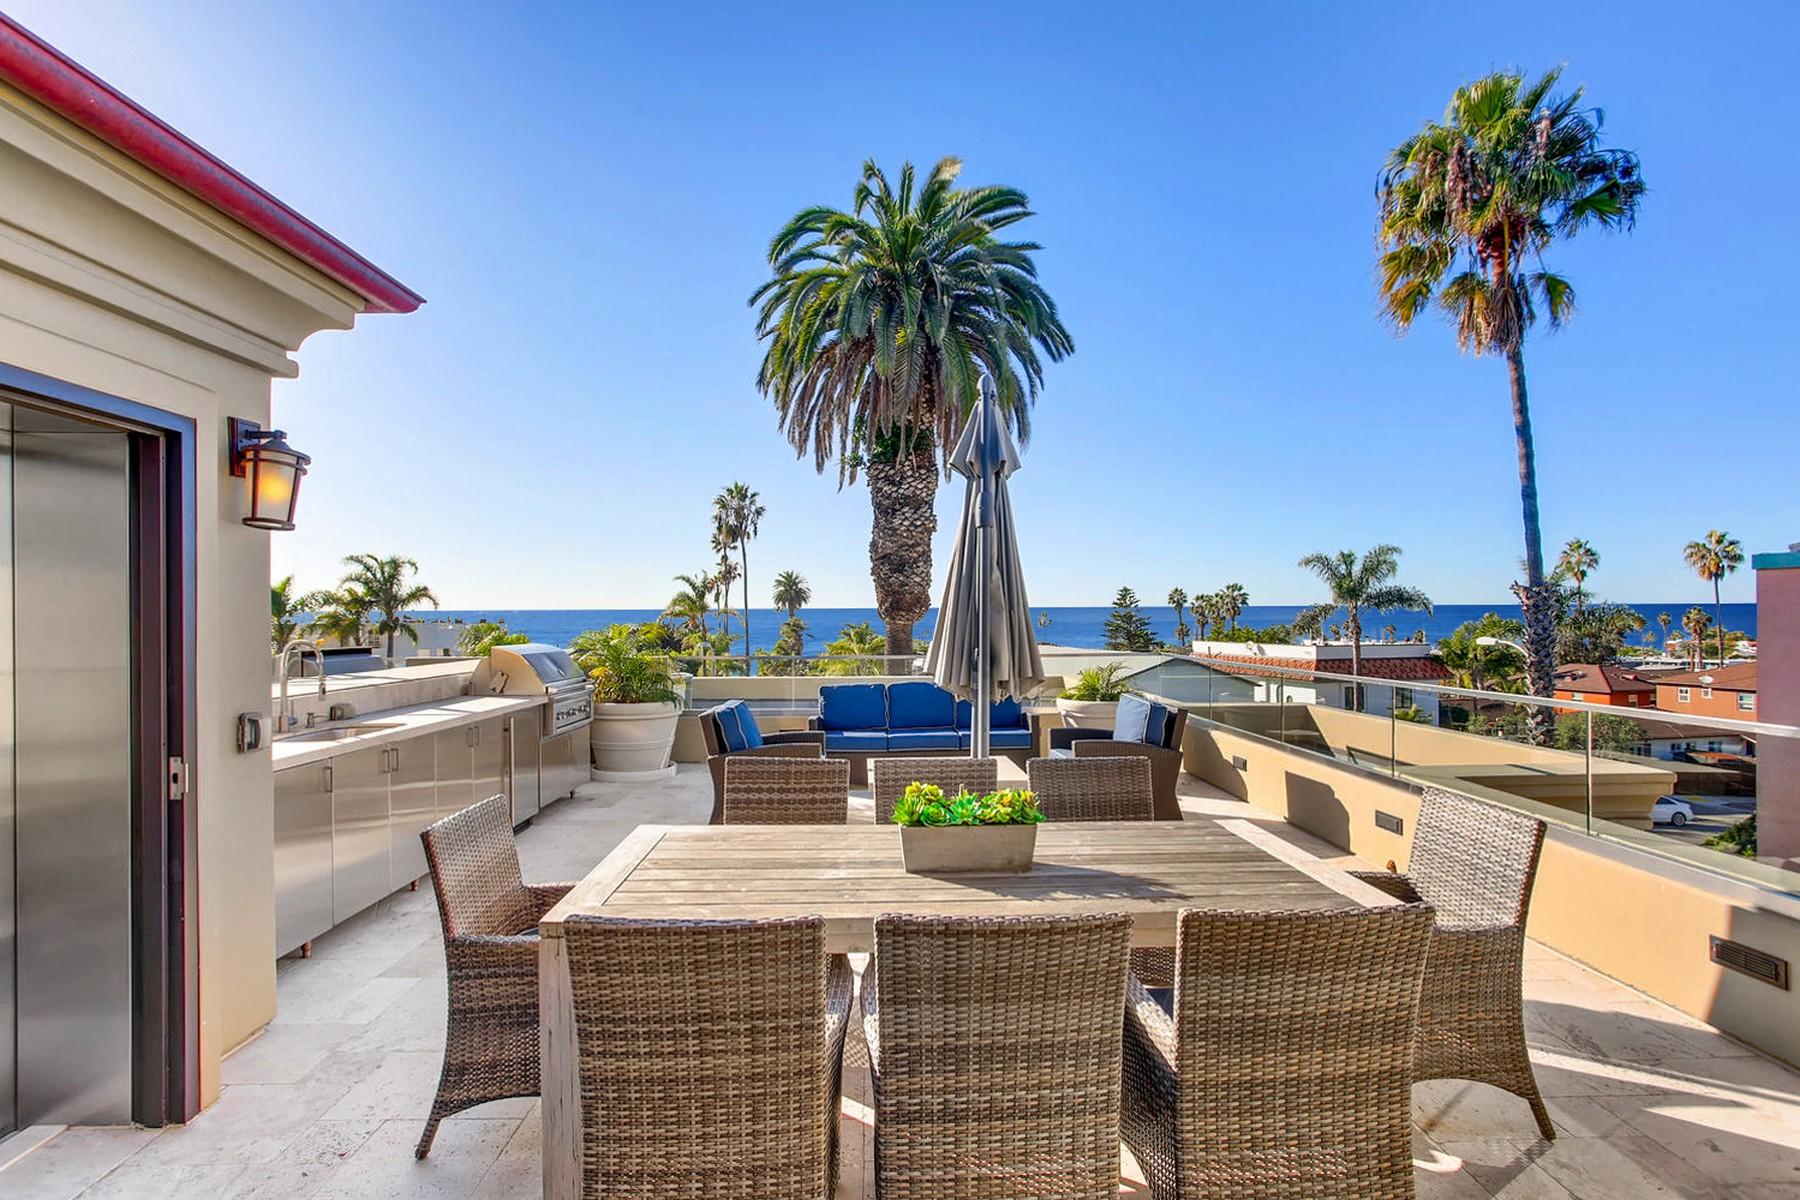 townhouses 为 销售 在 Elysian 6639 La Jolla Blvd 拉荷亚, 加利福尼亚州 92037 美国